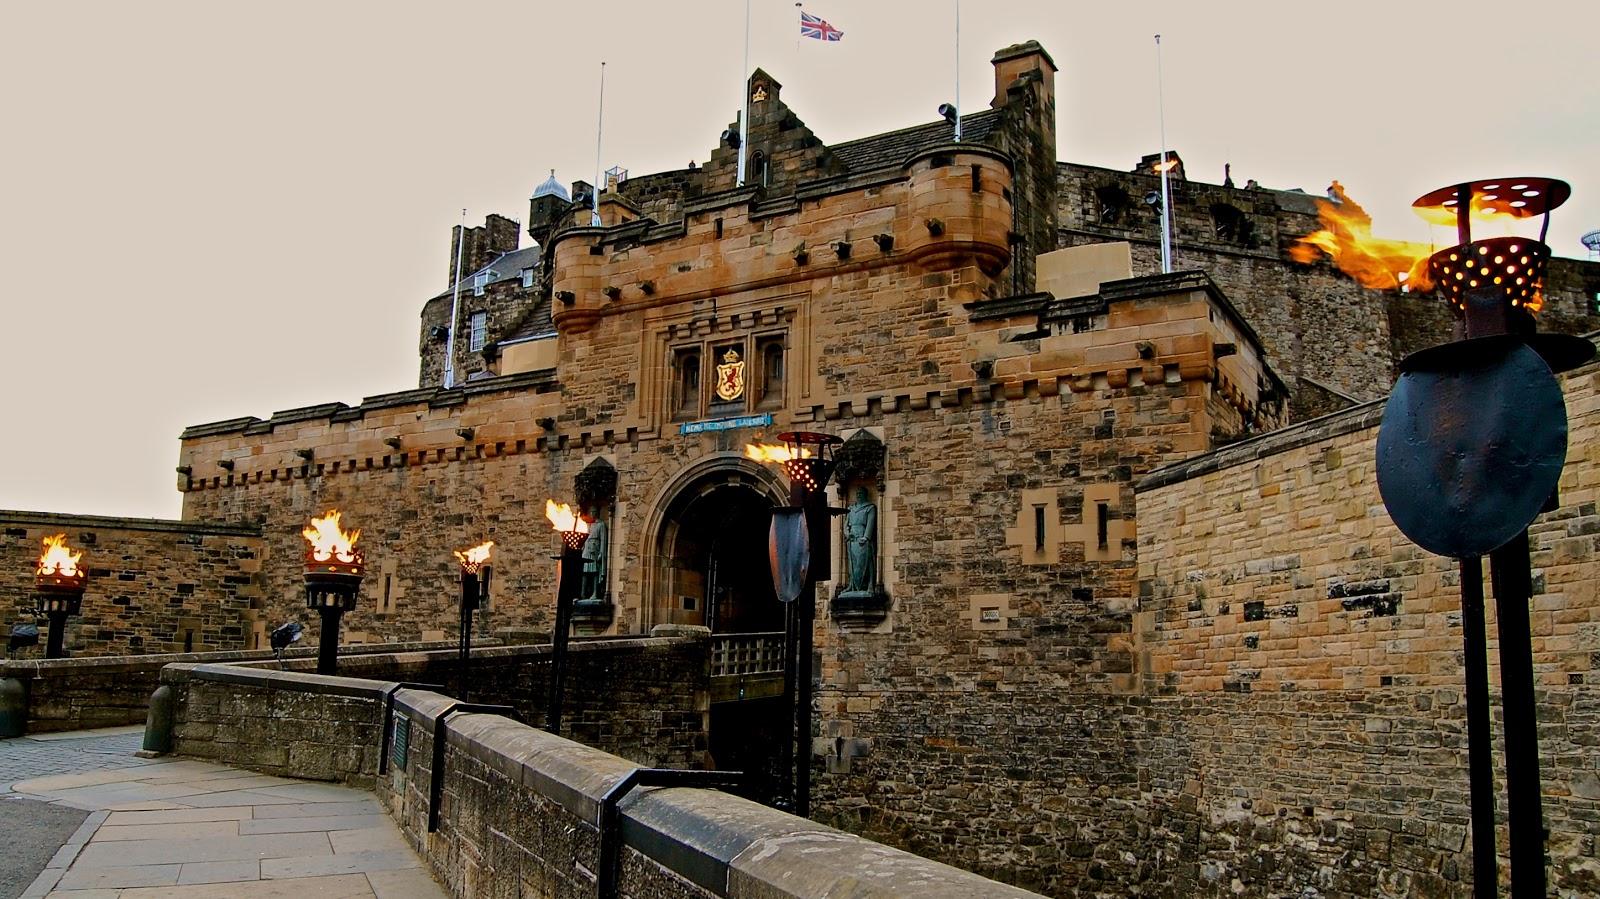 Entry gate to Edinburgh Castle, Scotland